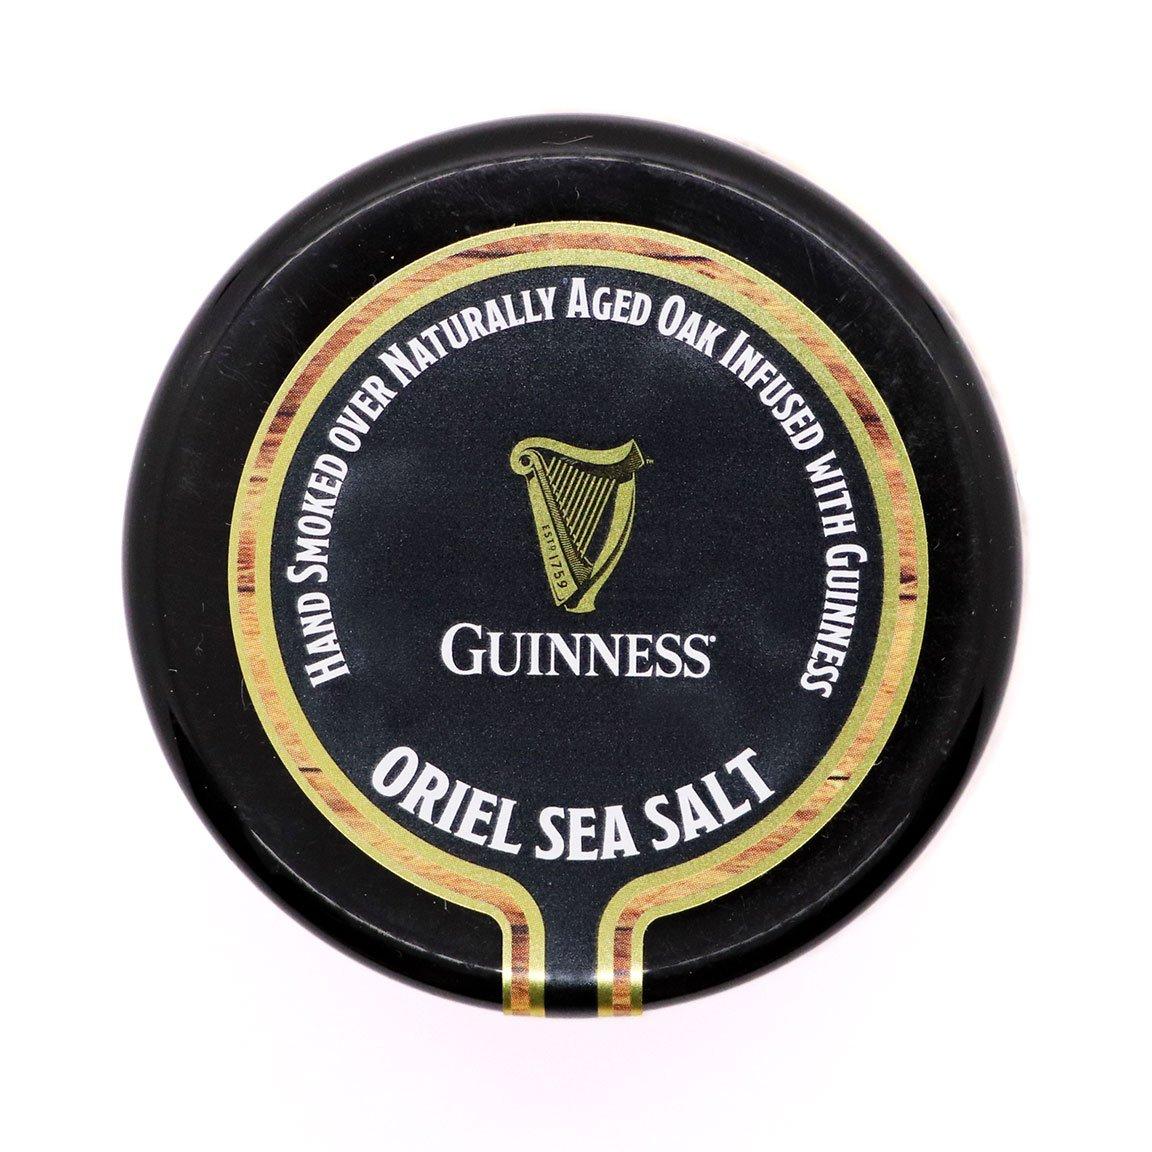 Oriel Sea Salt Guiness Smoked